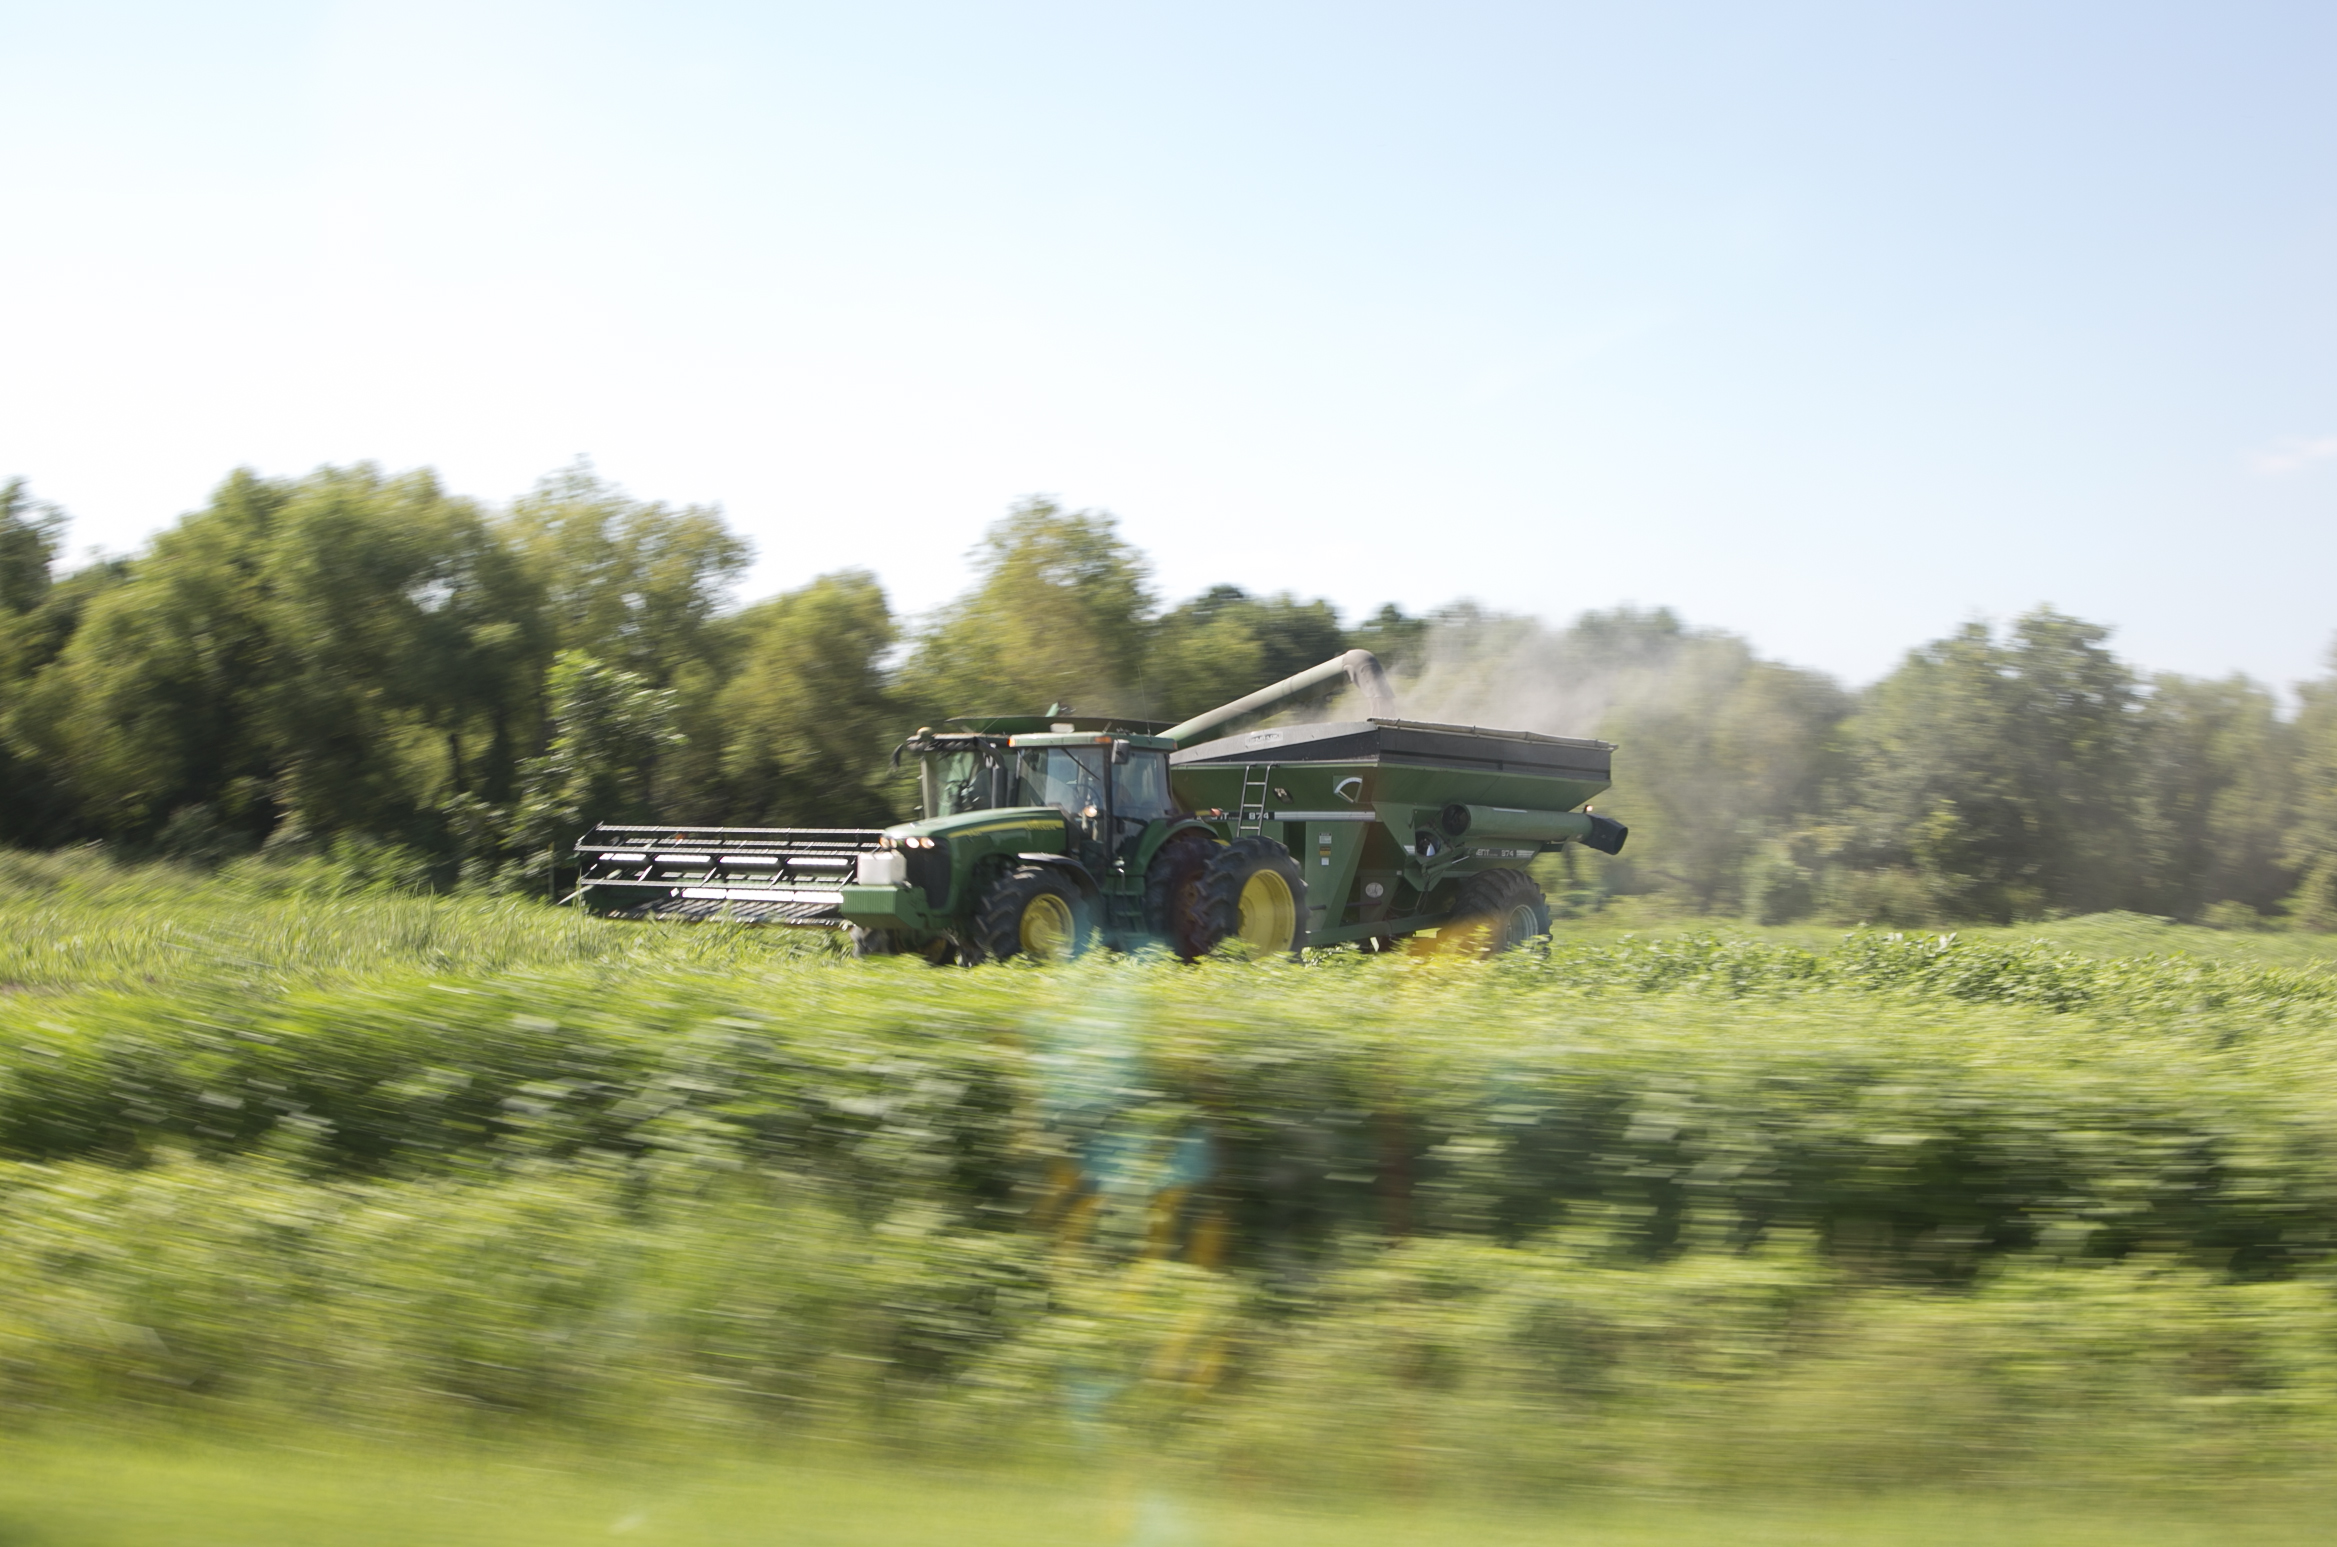 8-27-2016 Harvest